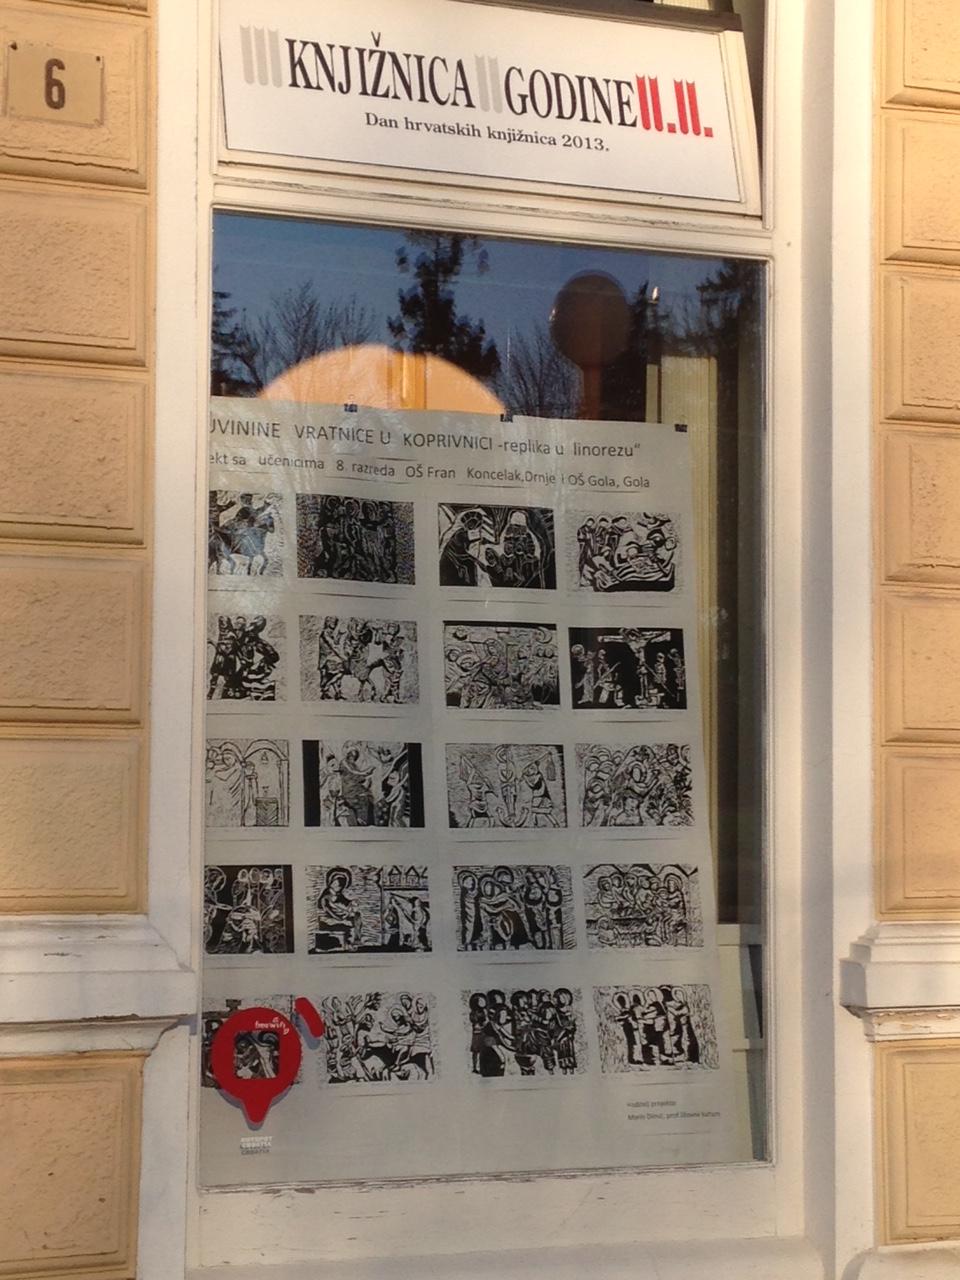 Replika u linorezu // Foto: OŠ Fran Koncelak Drnje